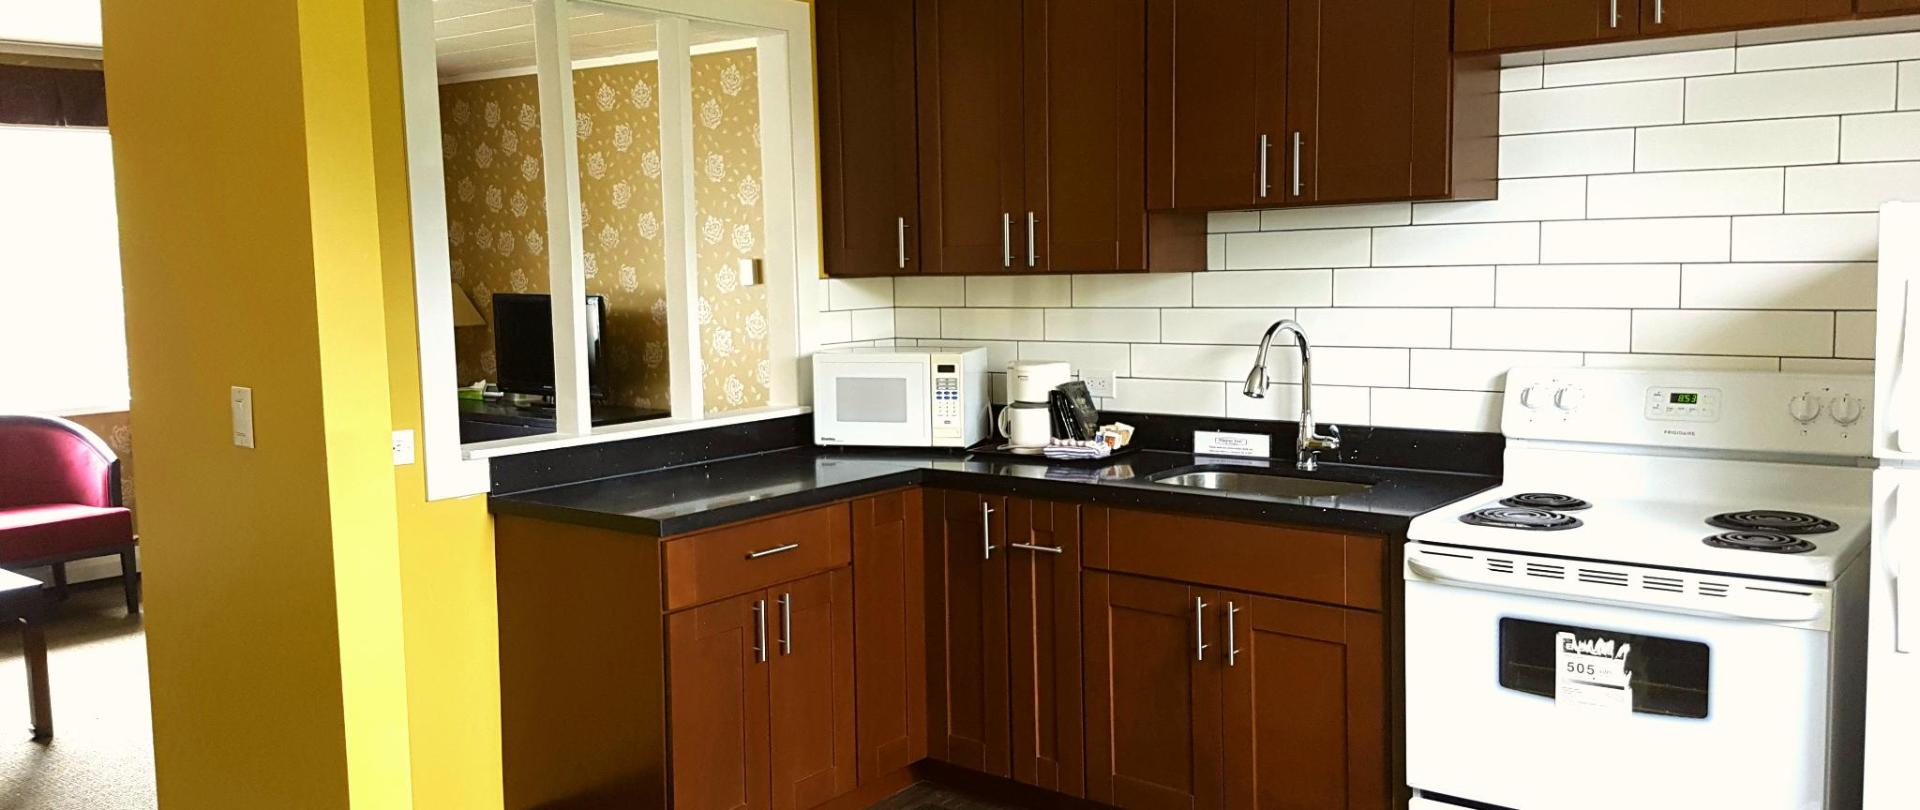 Two Bedroom Kitchen Suite - Kitchen 1.jpg